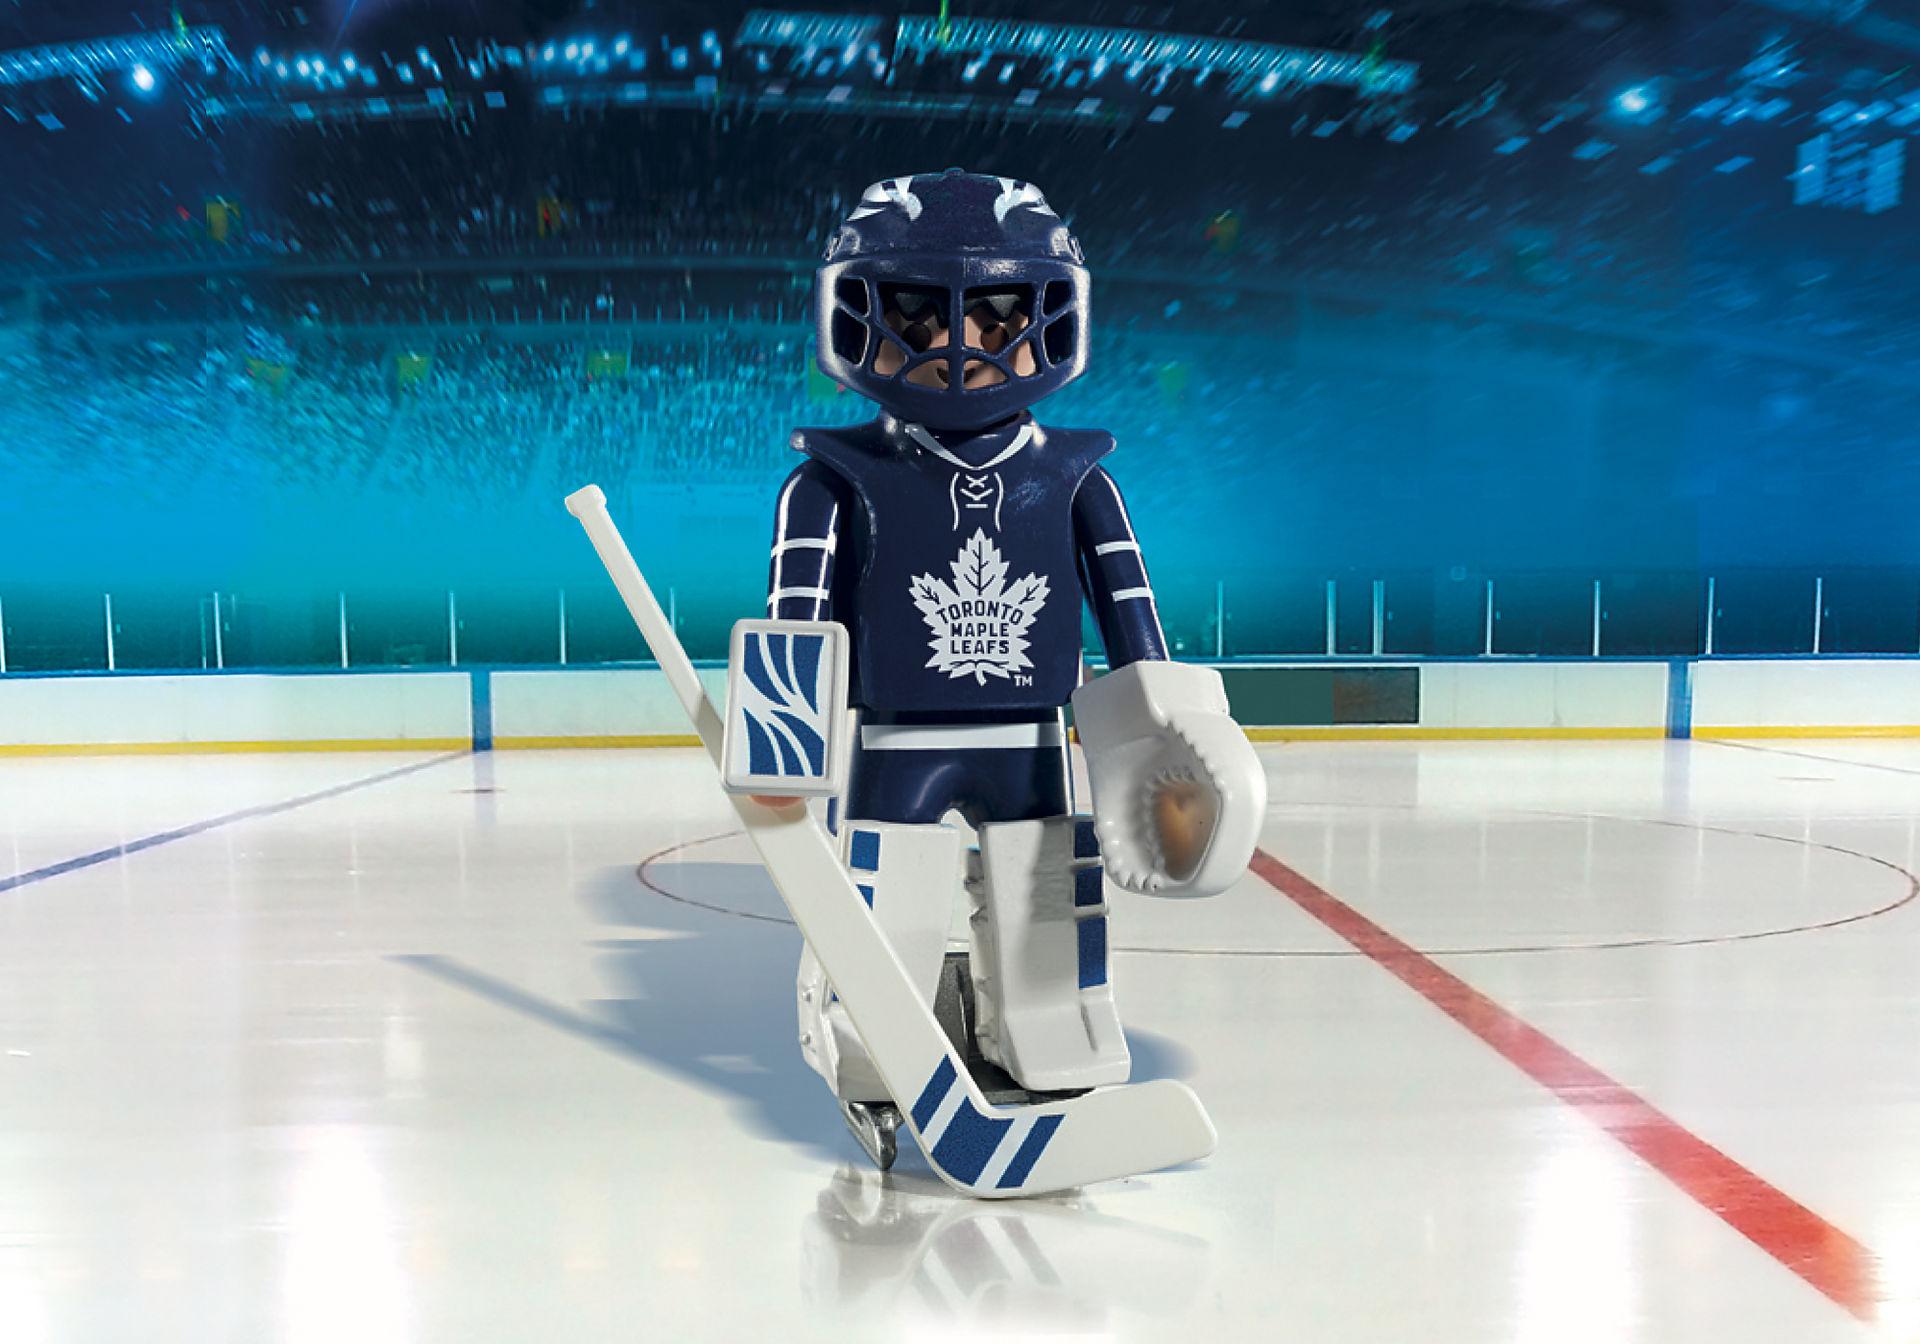 5083 NHL™ Toronto Maple Leafs™ Goalie zoom image1